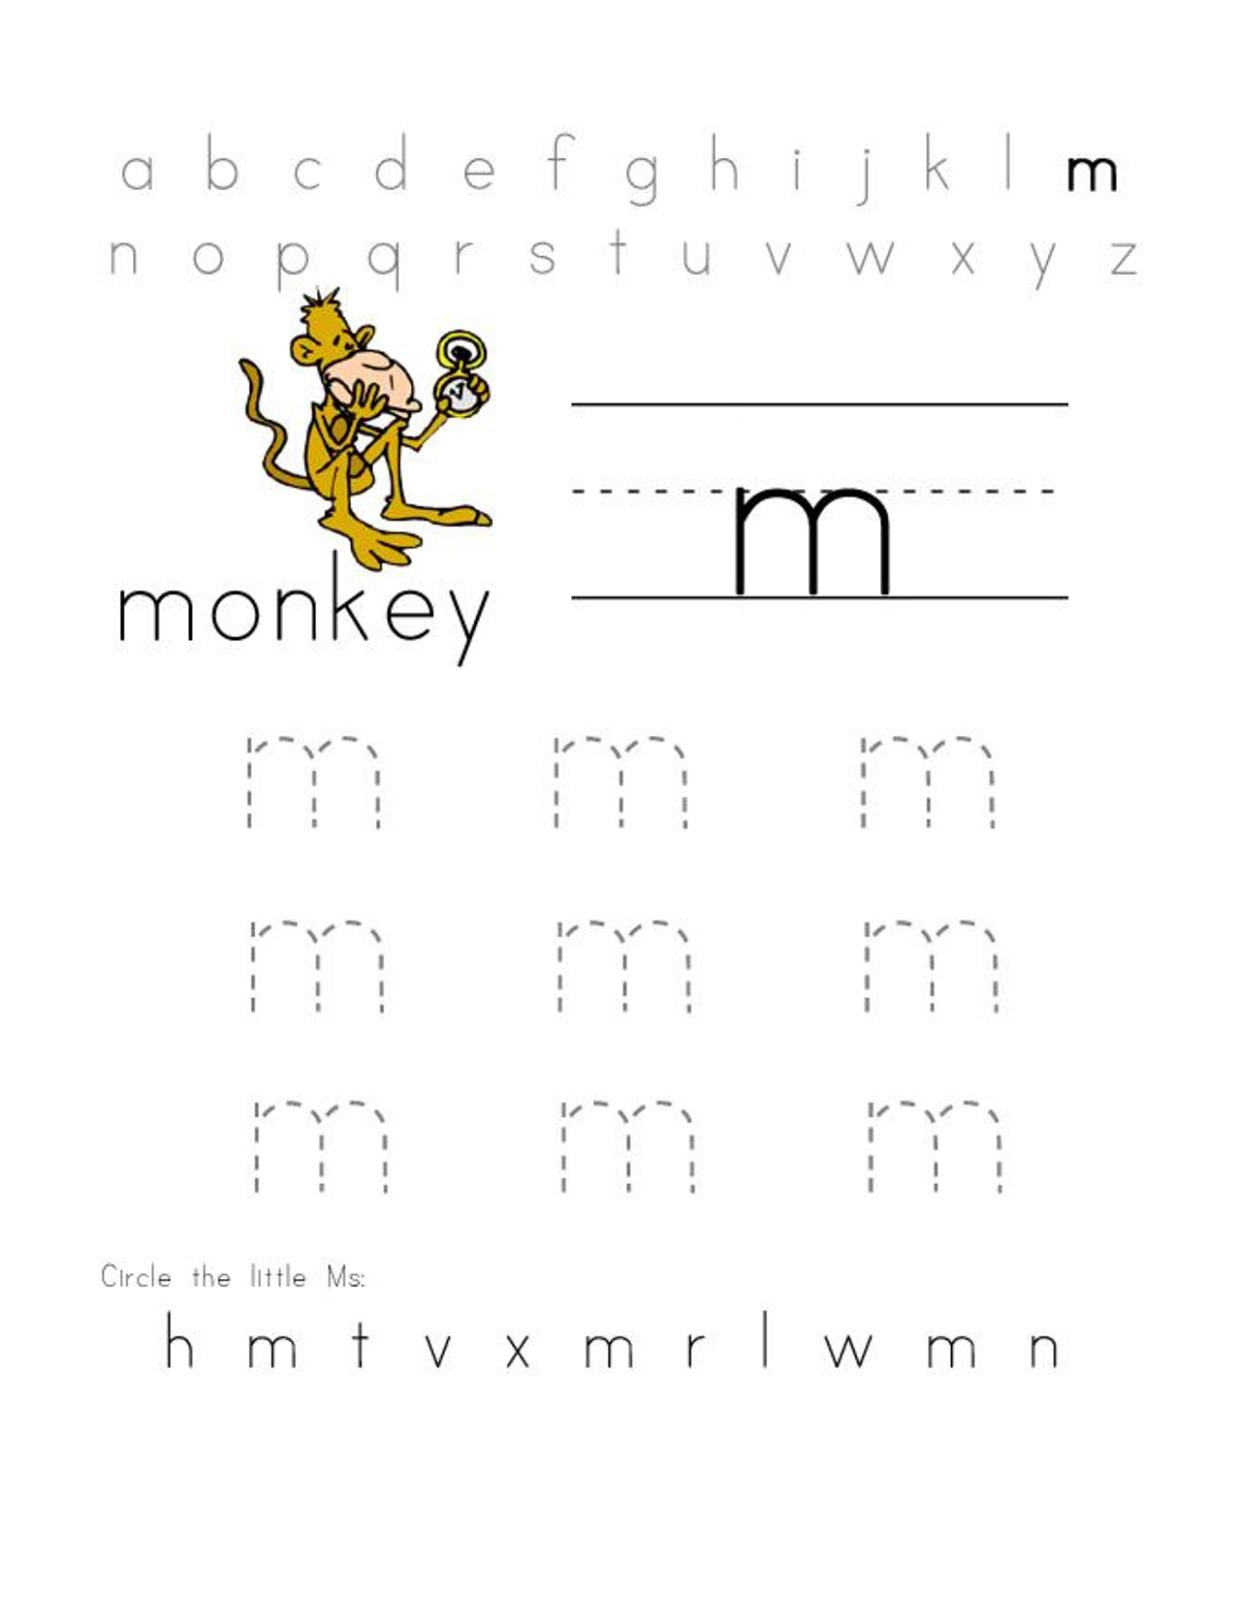 Letter M Worksheets | Activity Shelter - Letter M Puzzle Printable